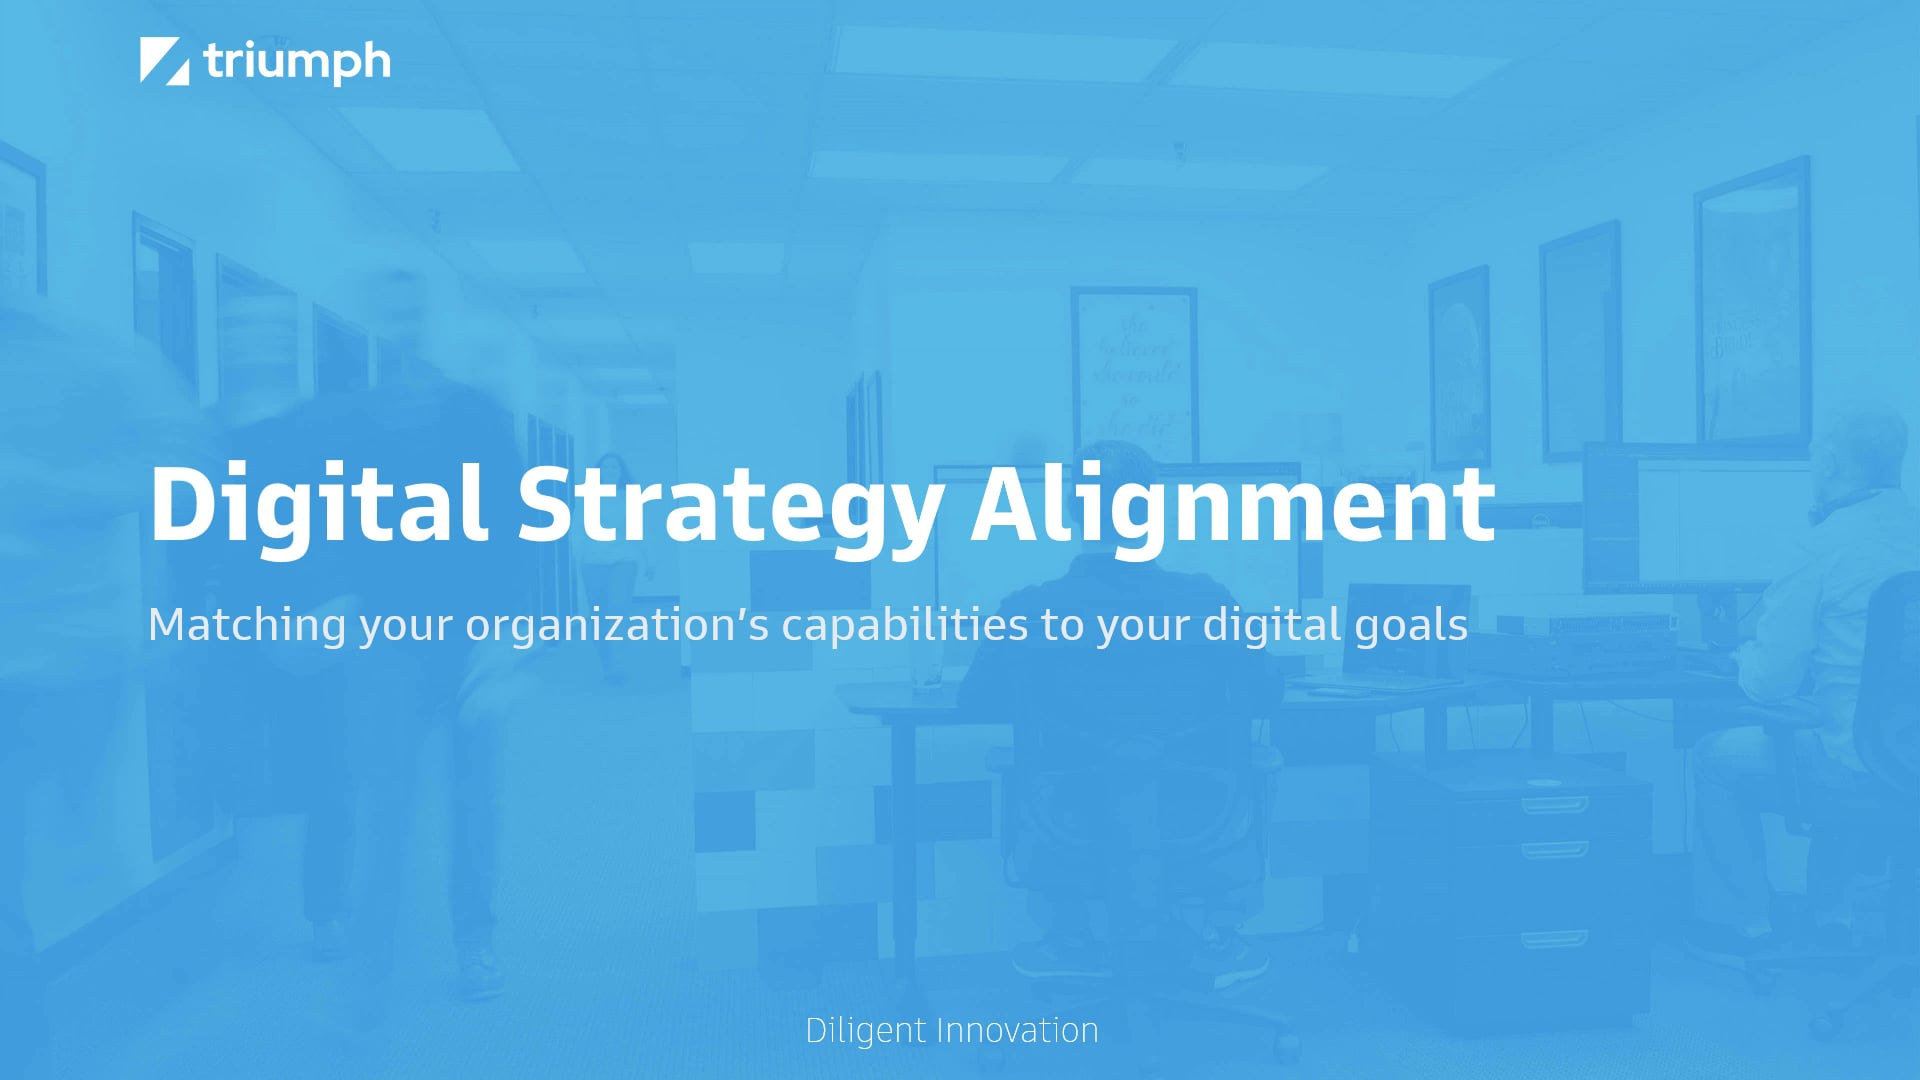 Digital Strategy Alignment